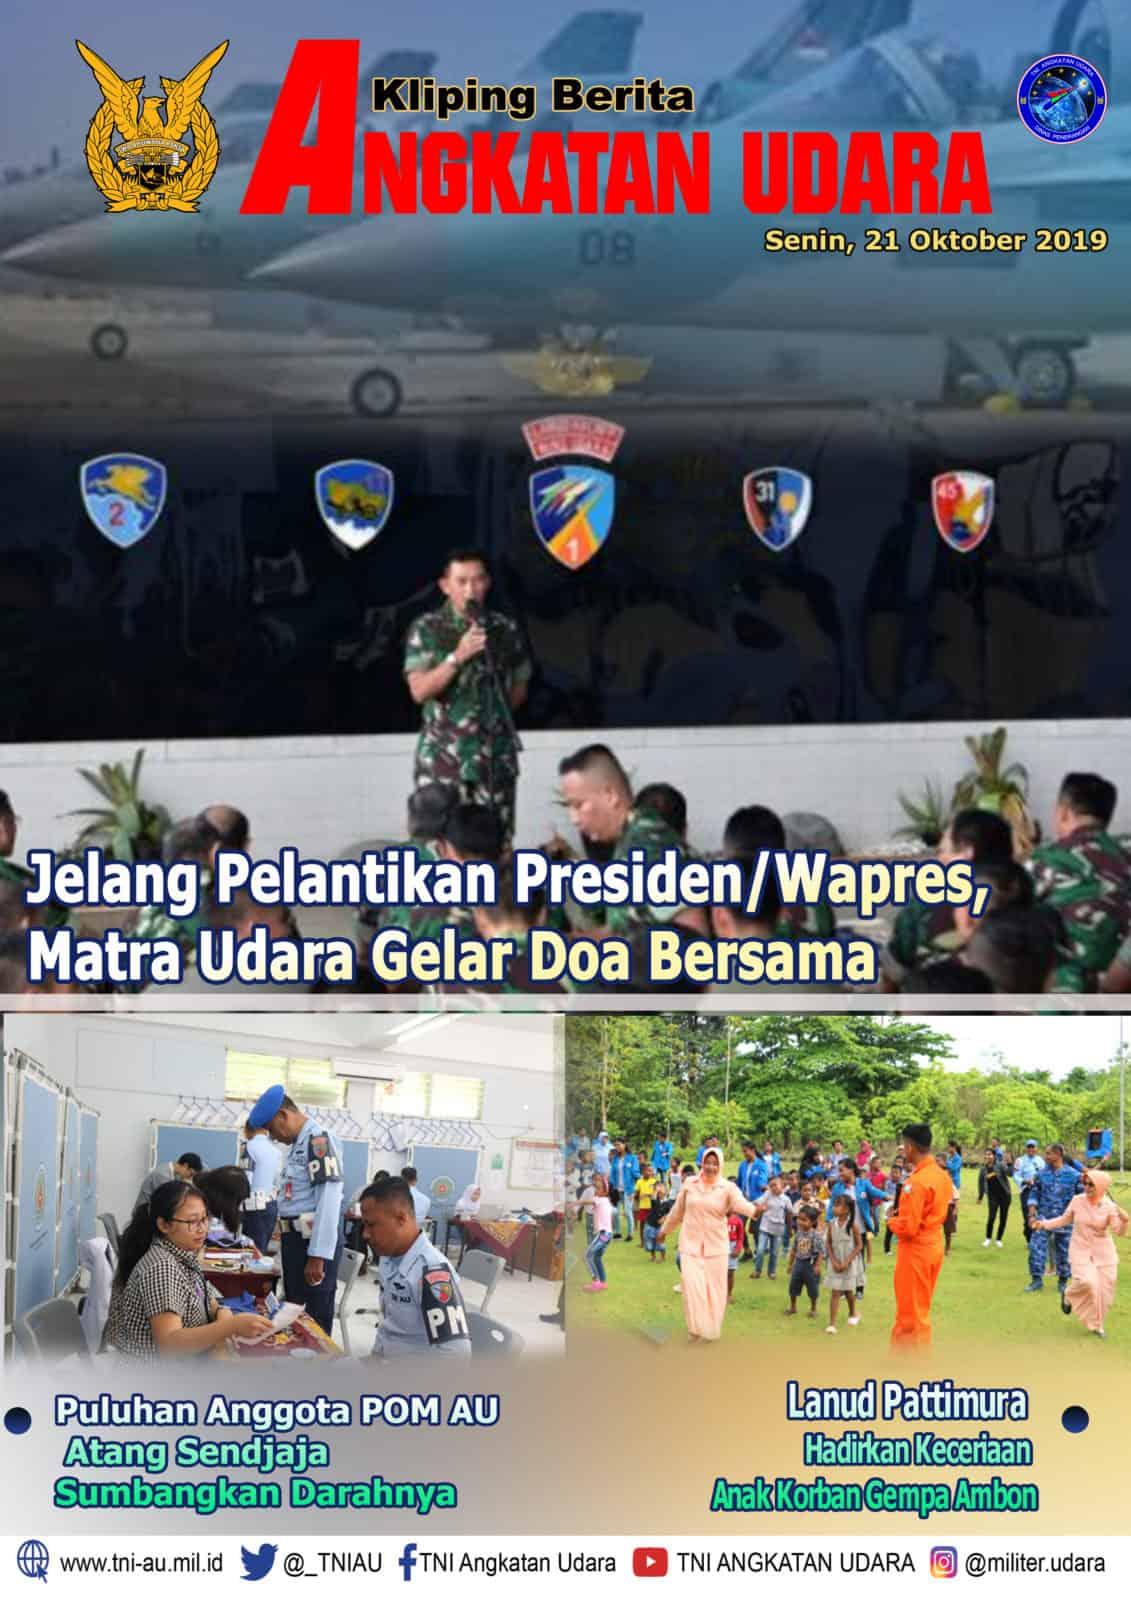 Kliping Berita Media 21 Oktober 2019